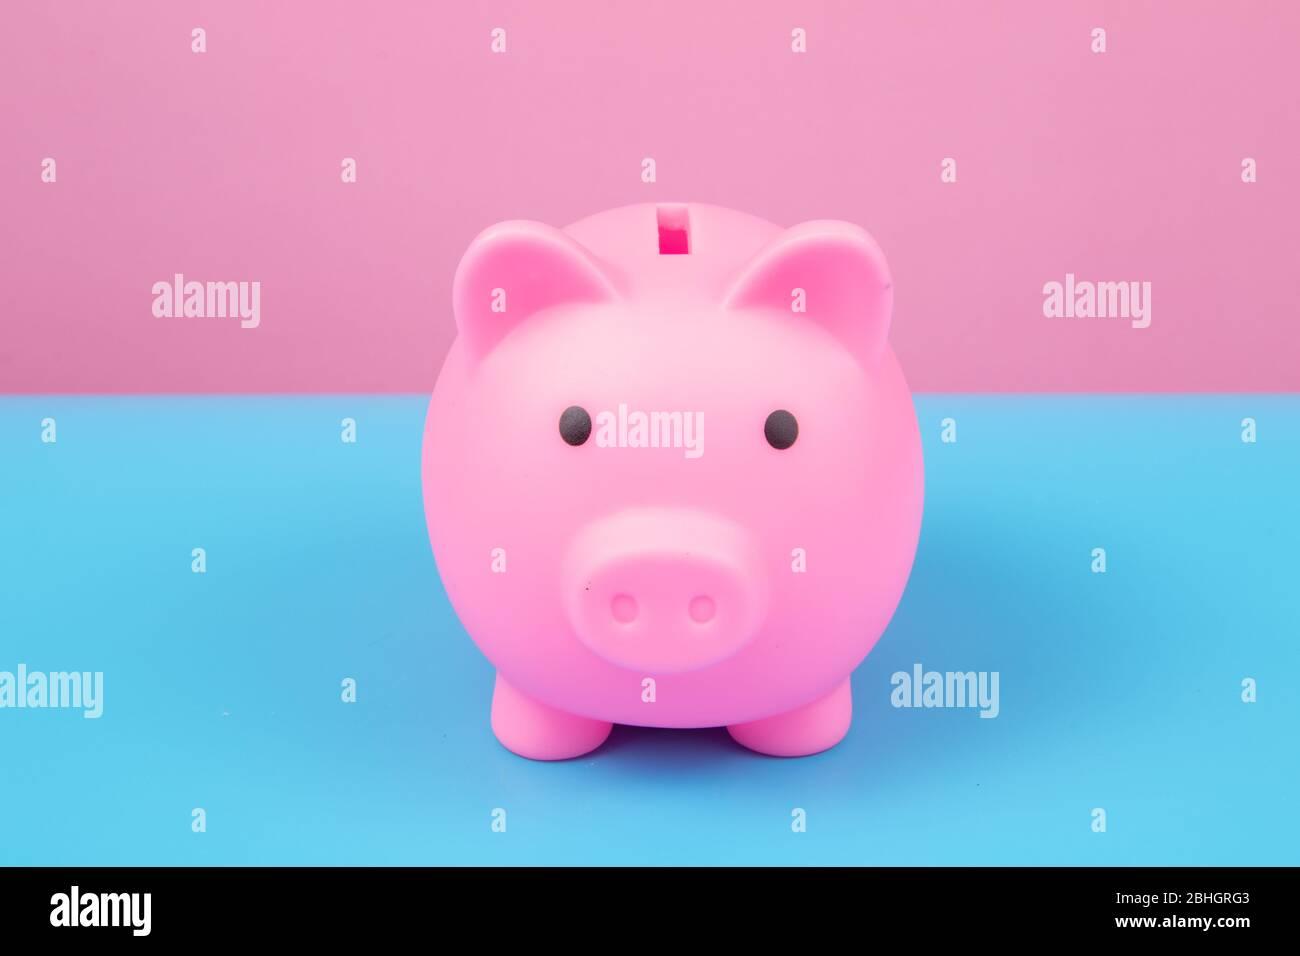 Pink Piggy bank on harmony background. Stock Photo